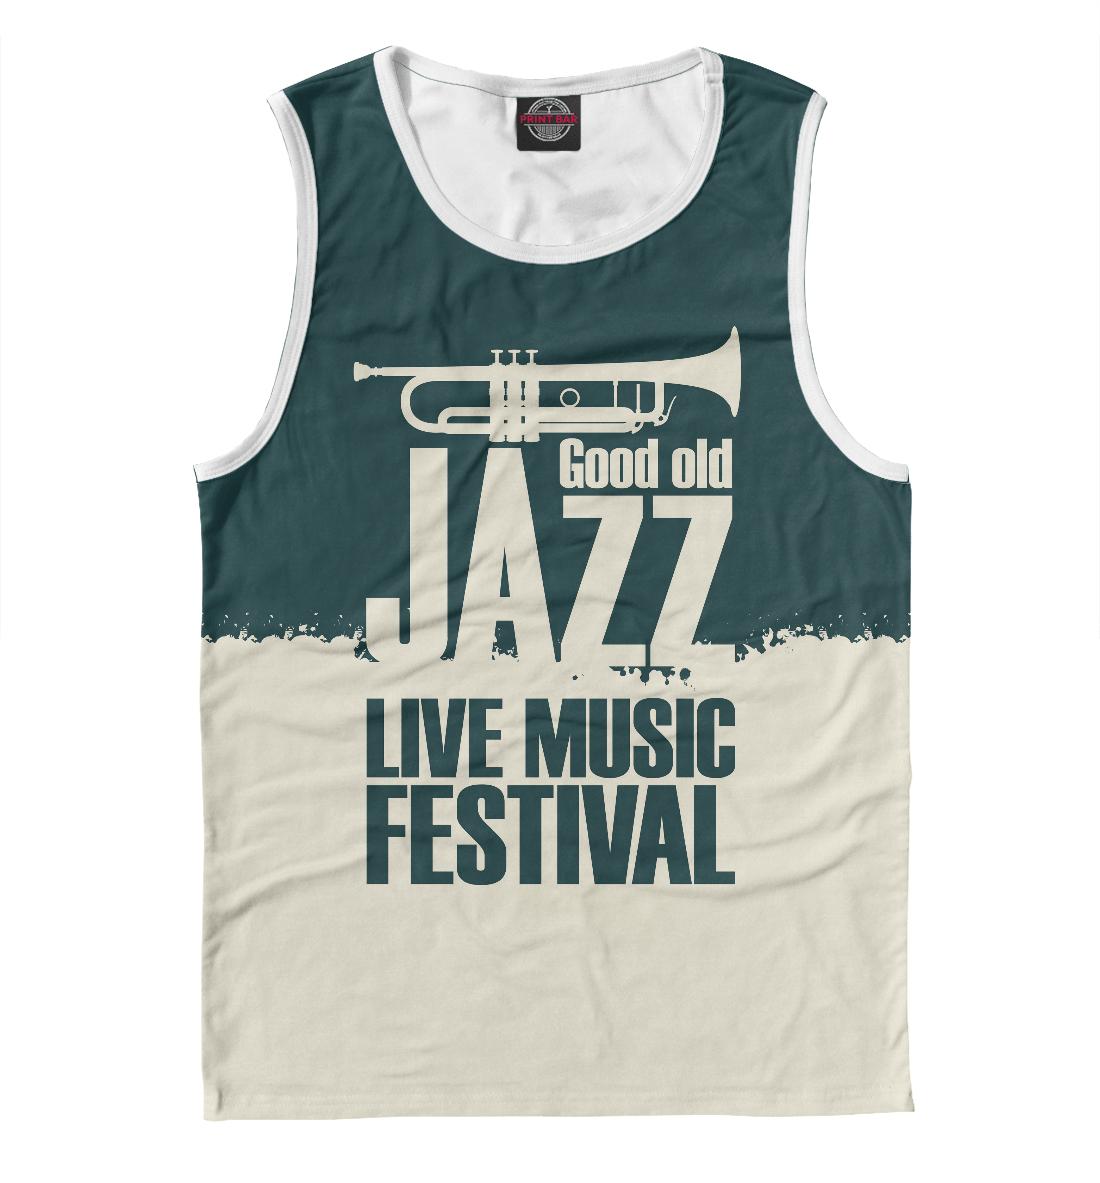 feuertanz festival 2009 Jazz festival